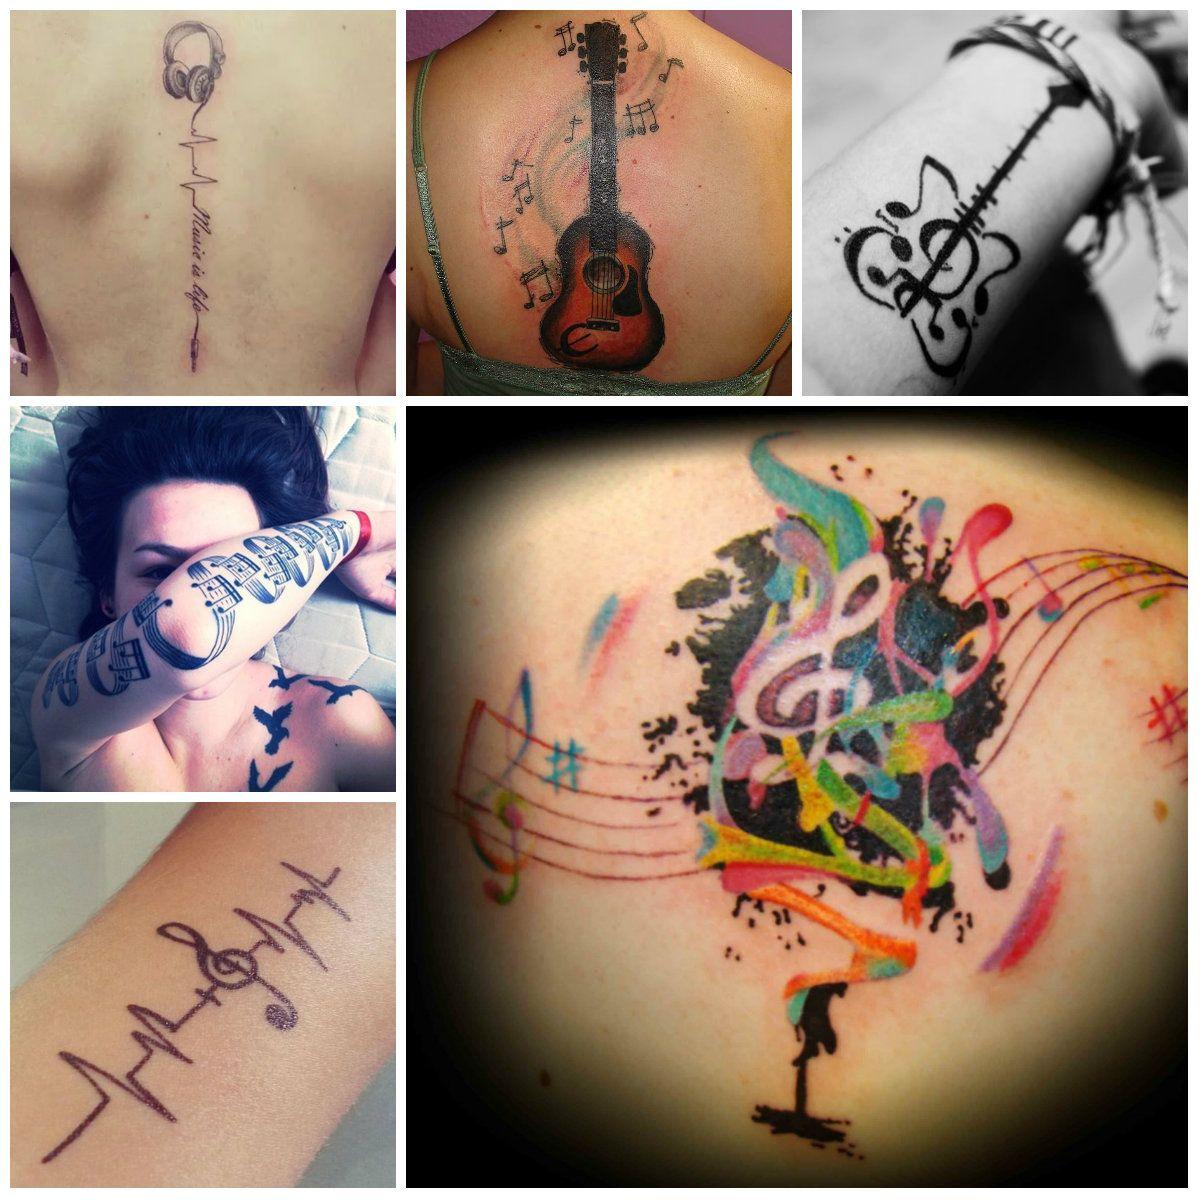 Music tattoo designs tattoo ideas pictures tattoo ideas pictures - Cool Music Tattoo Designs 2016